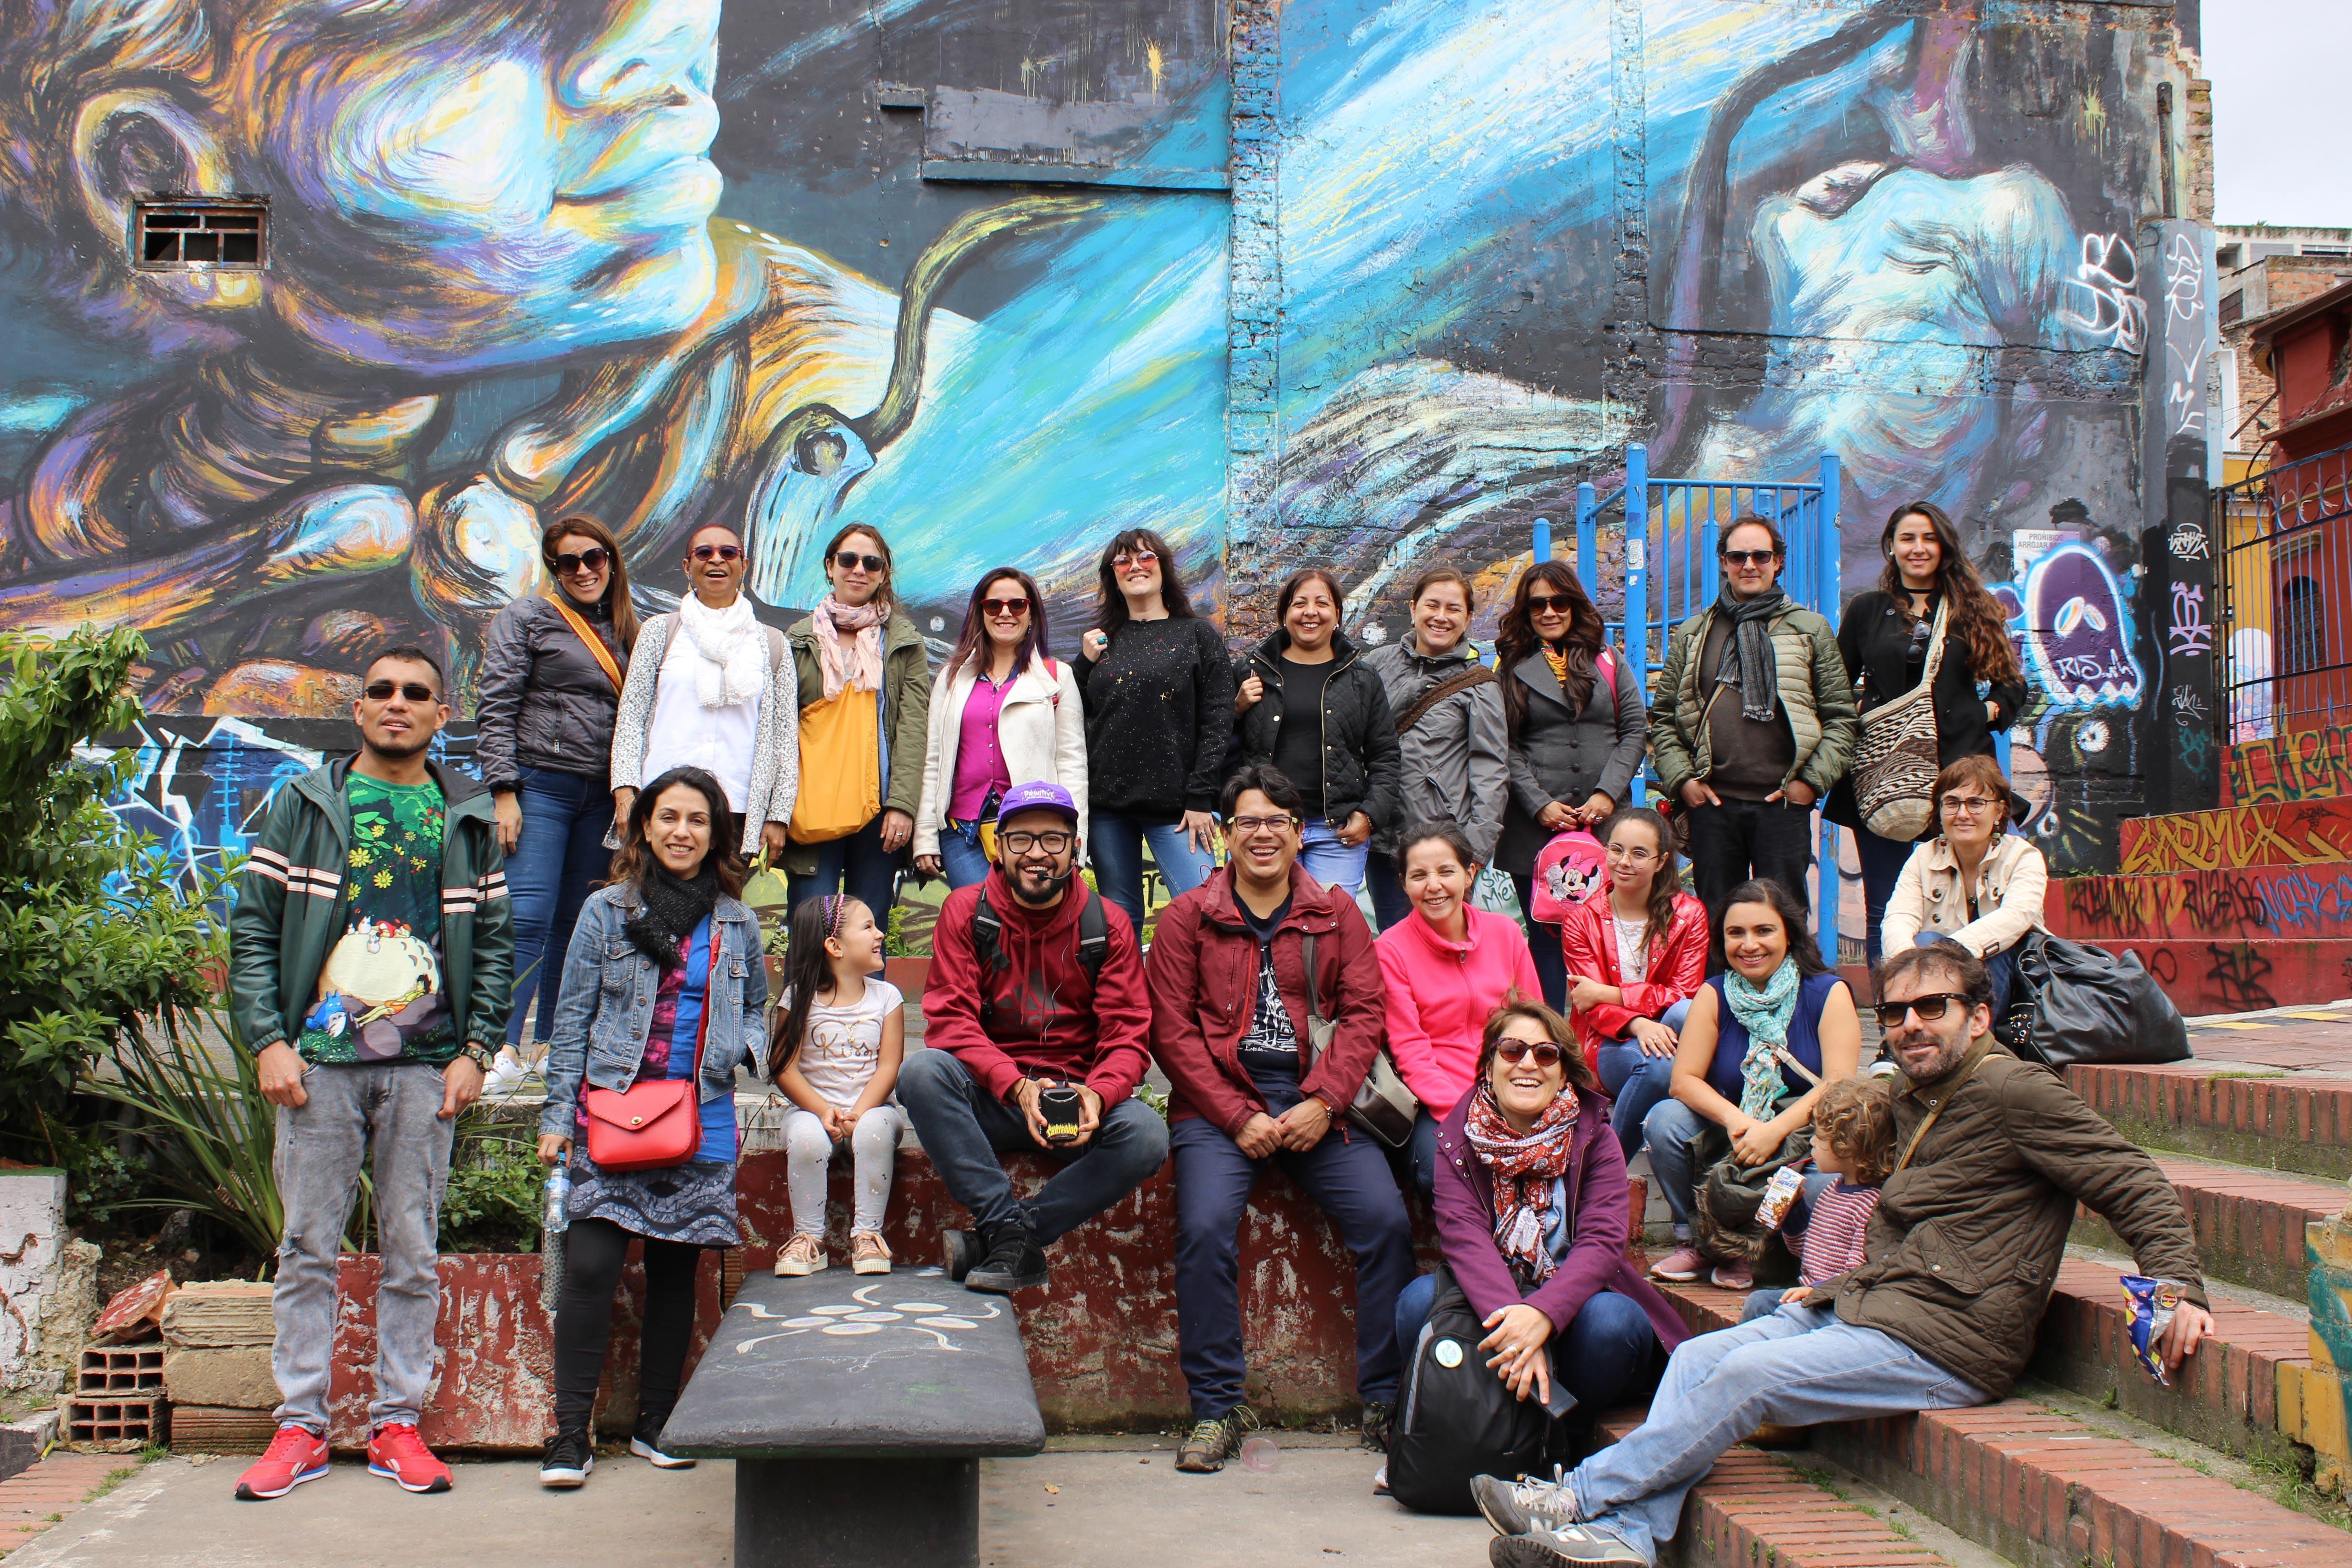 SPSS program participants in Bogotá June 2019